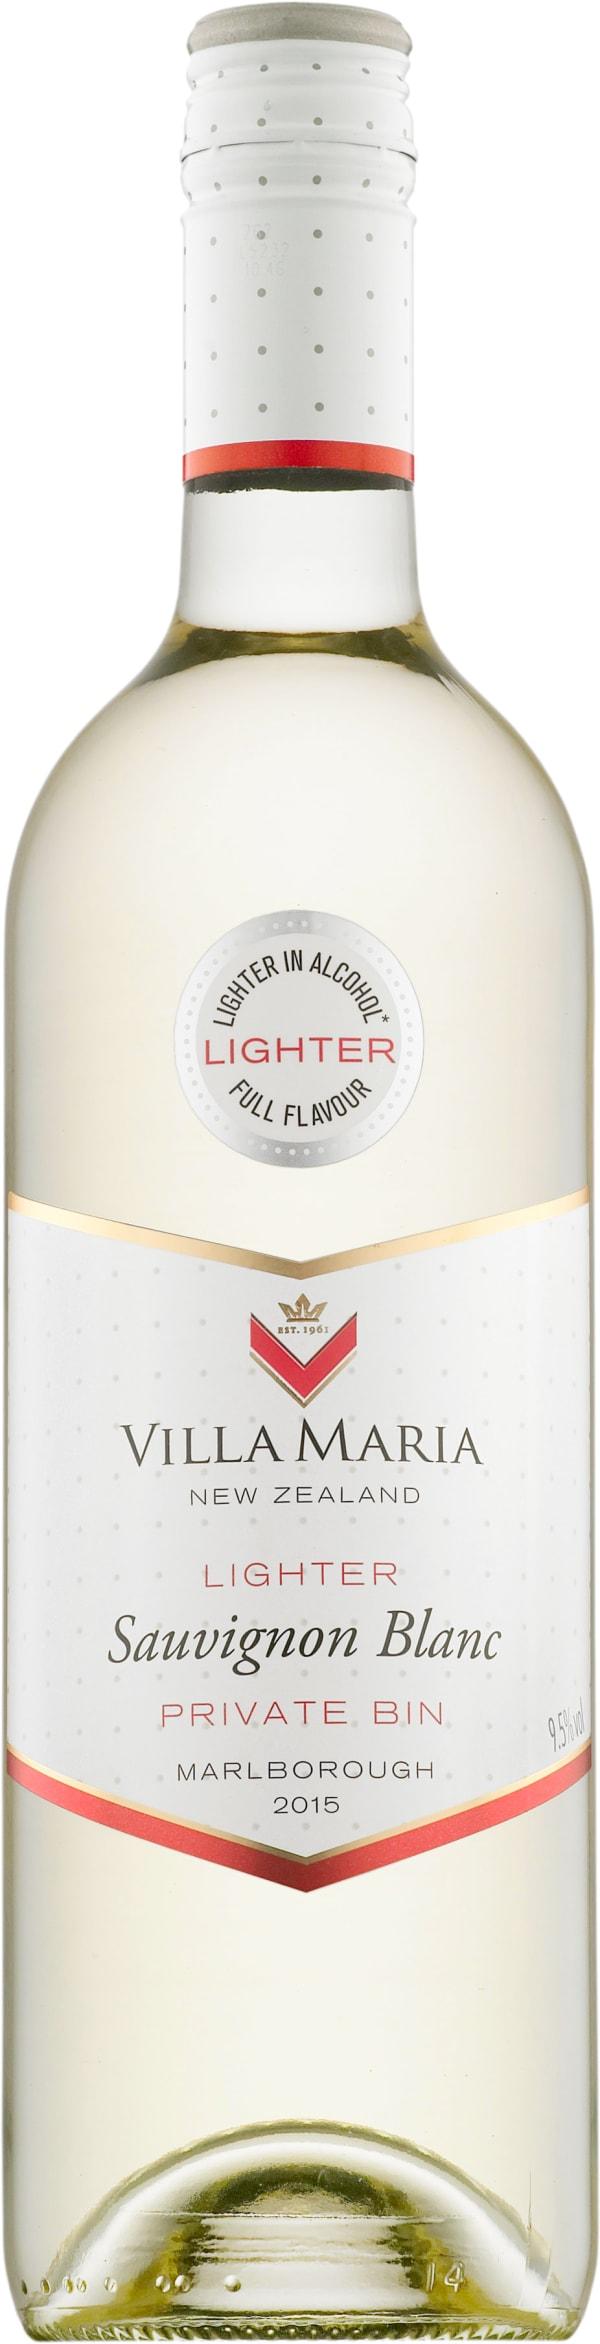 Villa Maria Lighter Sauvignon Blanc 2018